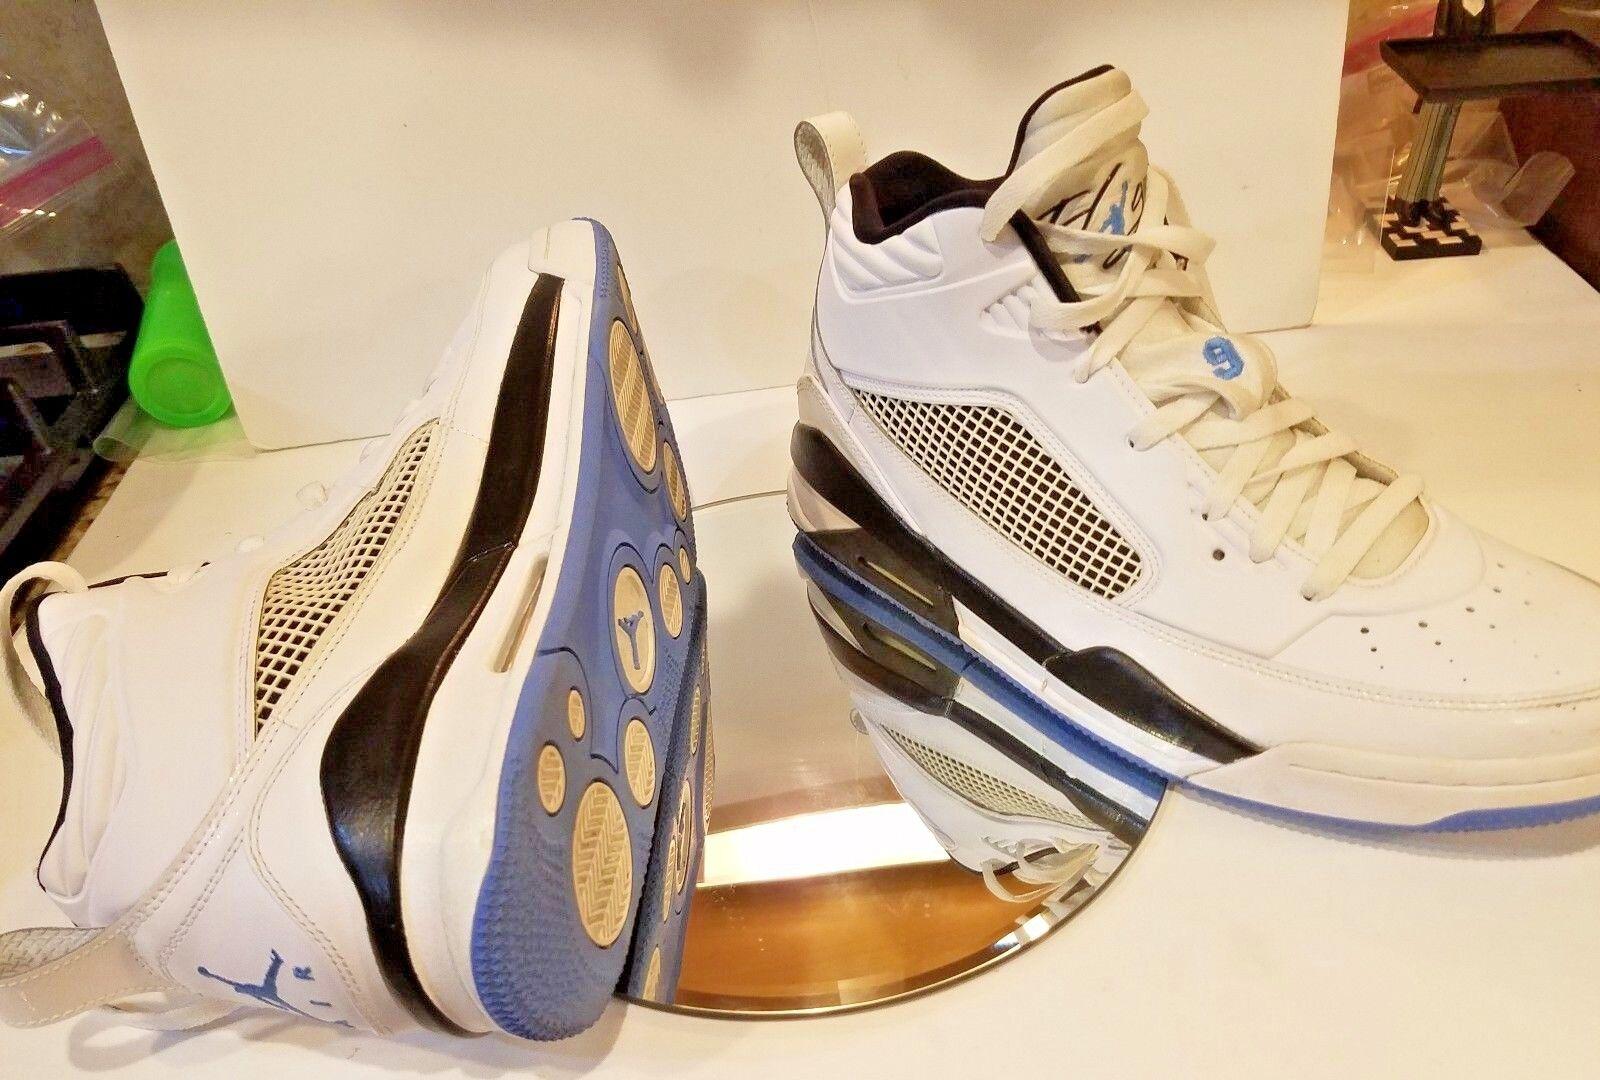 Nike Air Jordan Flight 9 High tops Navy blueee White Retro Men's Size 12